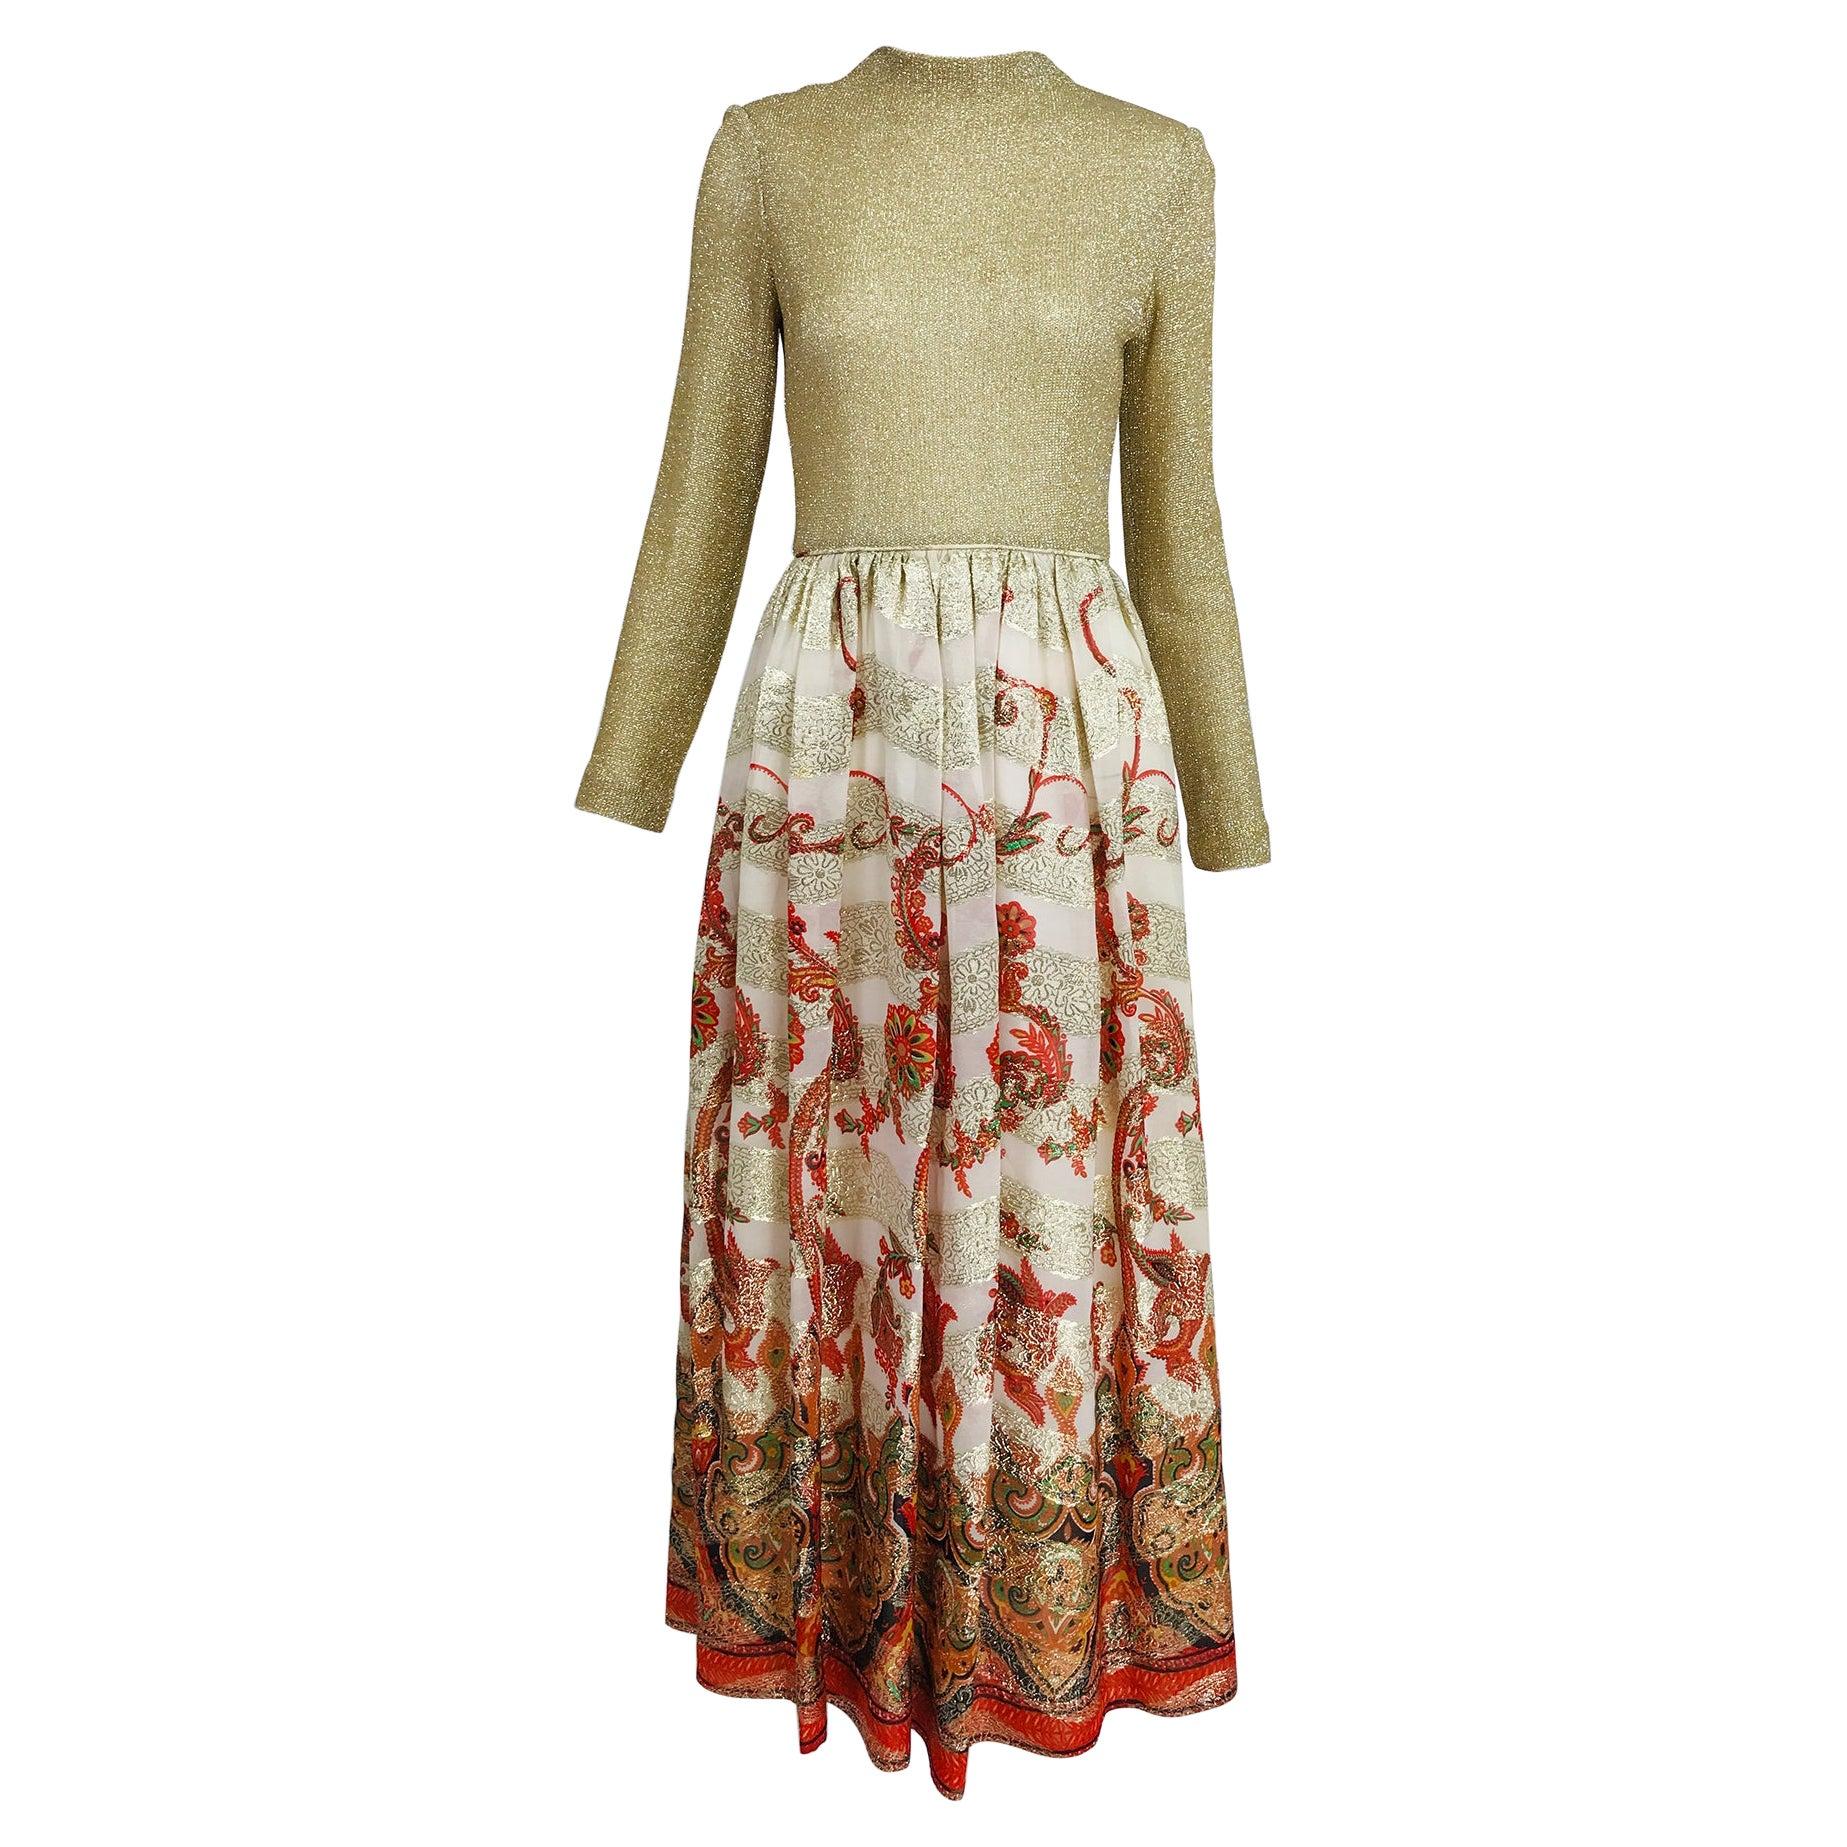 Vintage 1970s Saks Fifth Ave. Gold Metallic Coral Brocade Maxi Dress